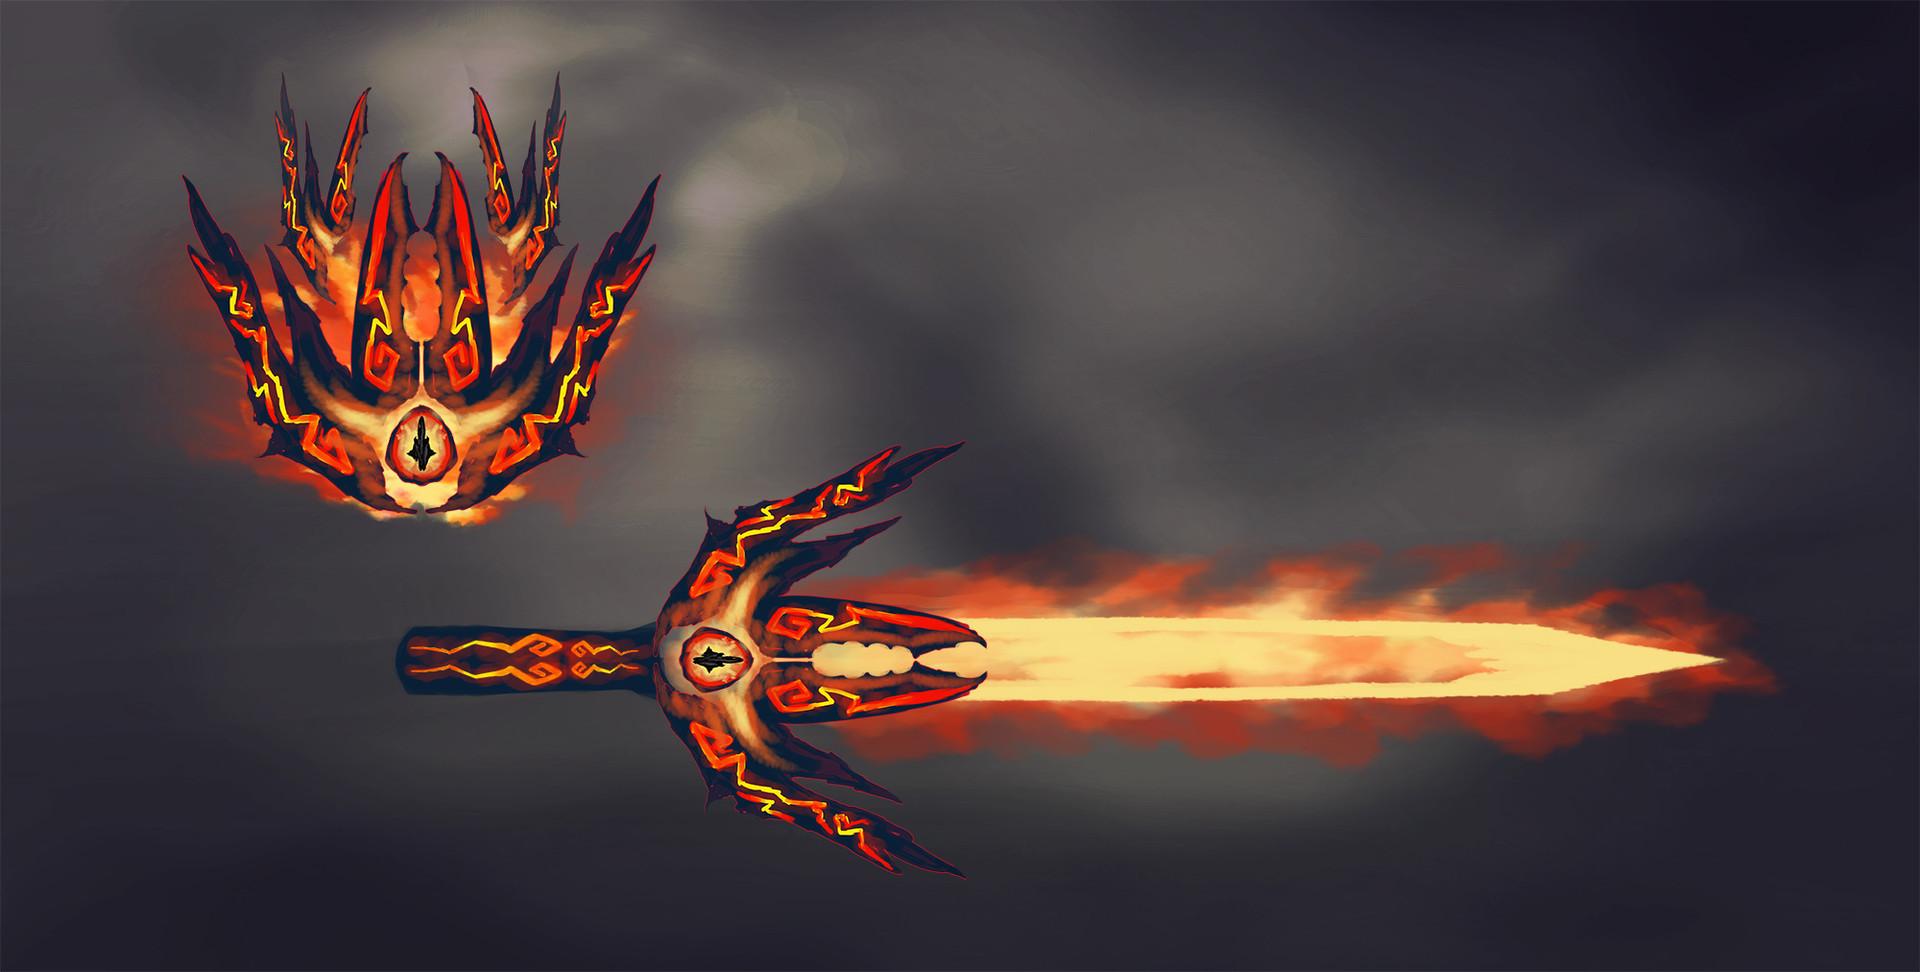 Orm irian firelionweapon02